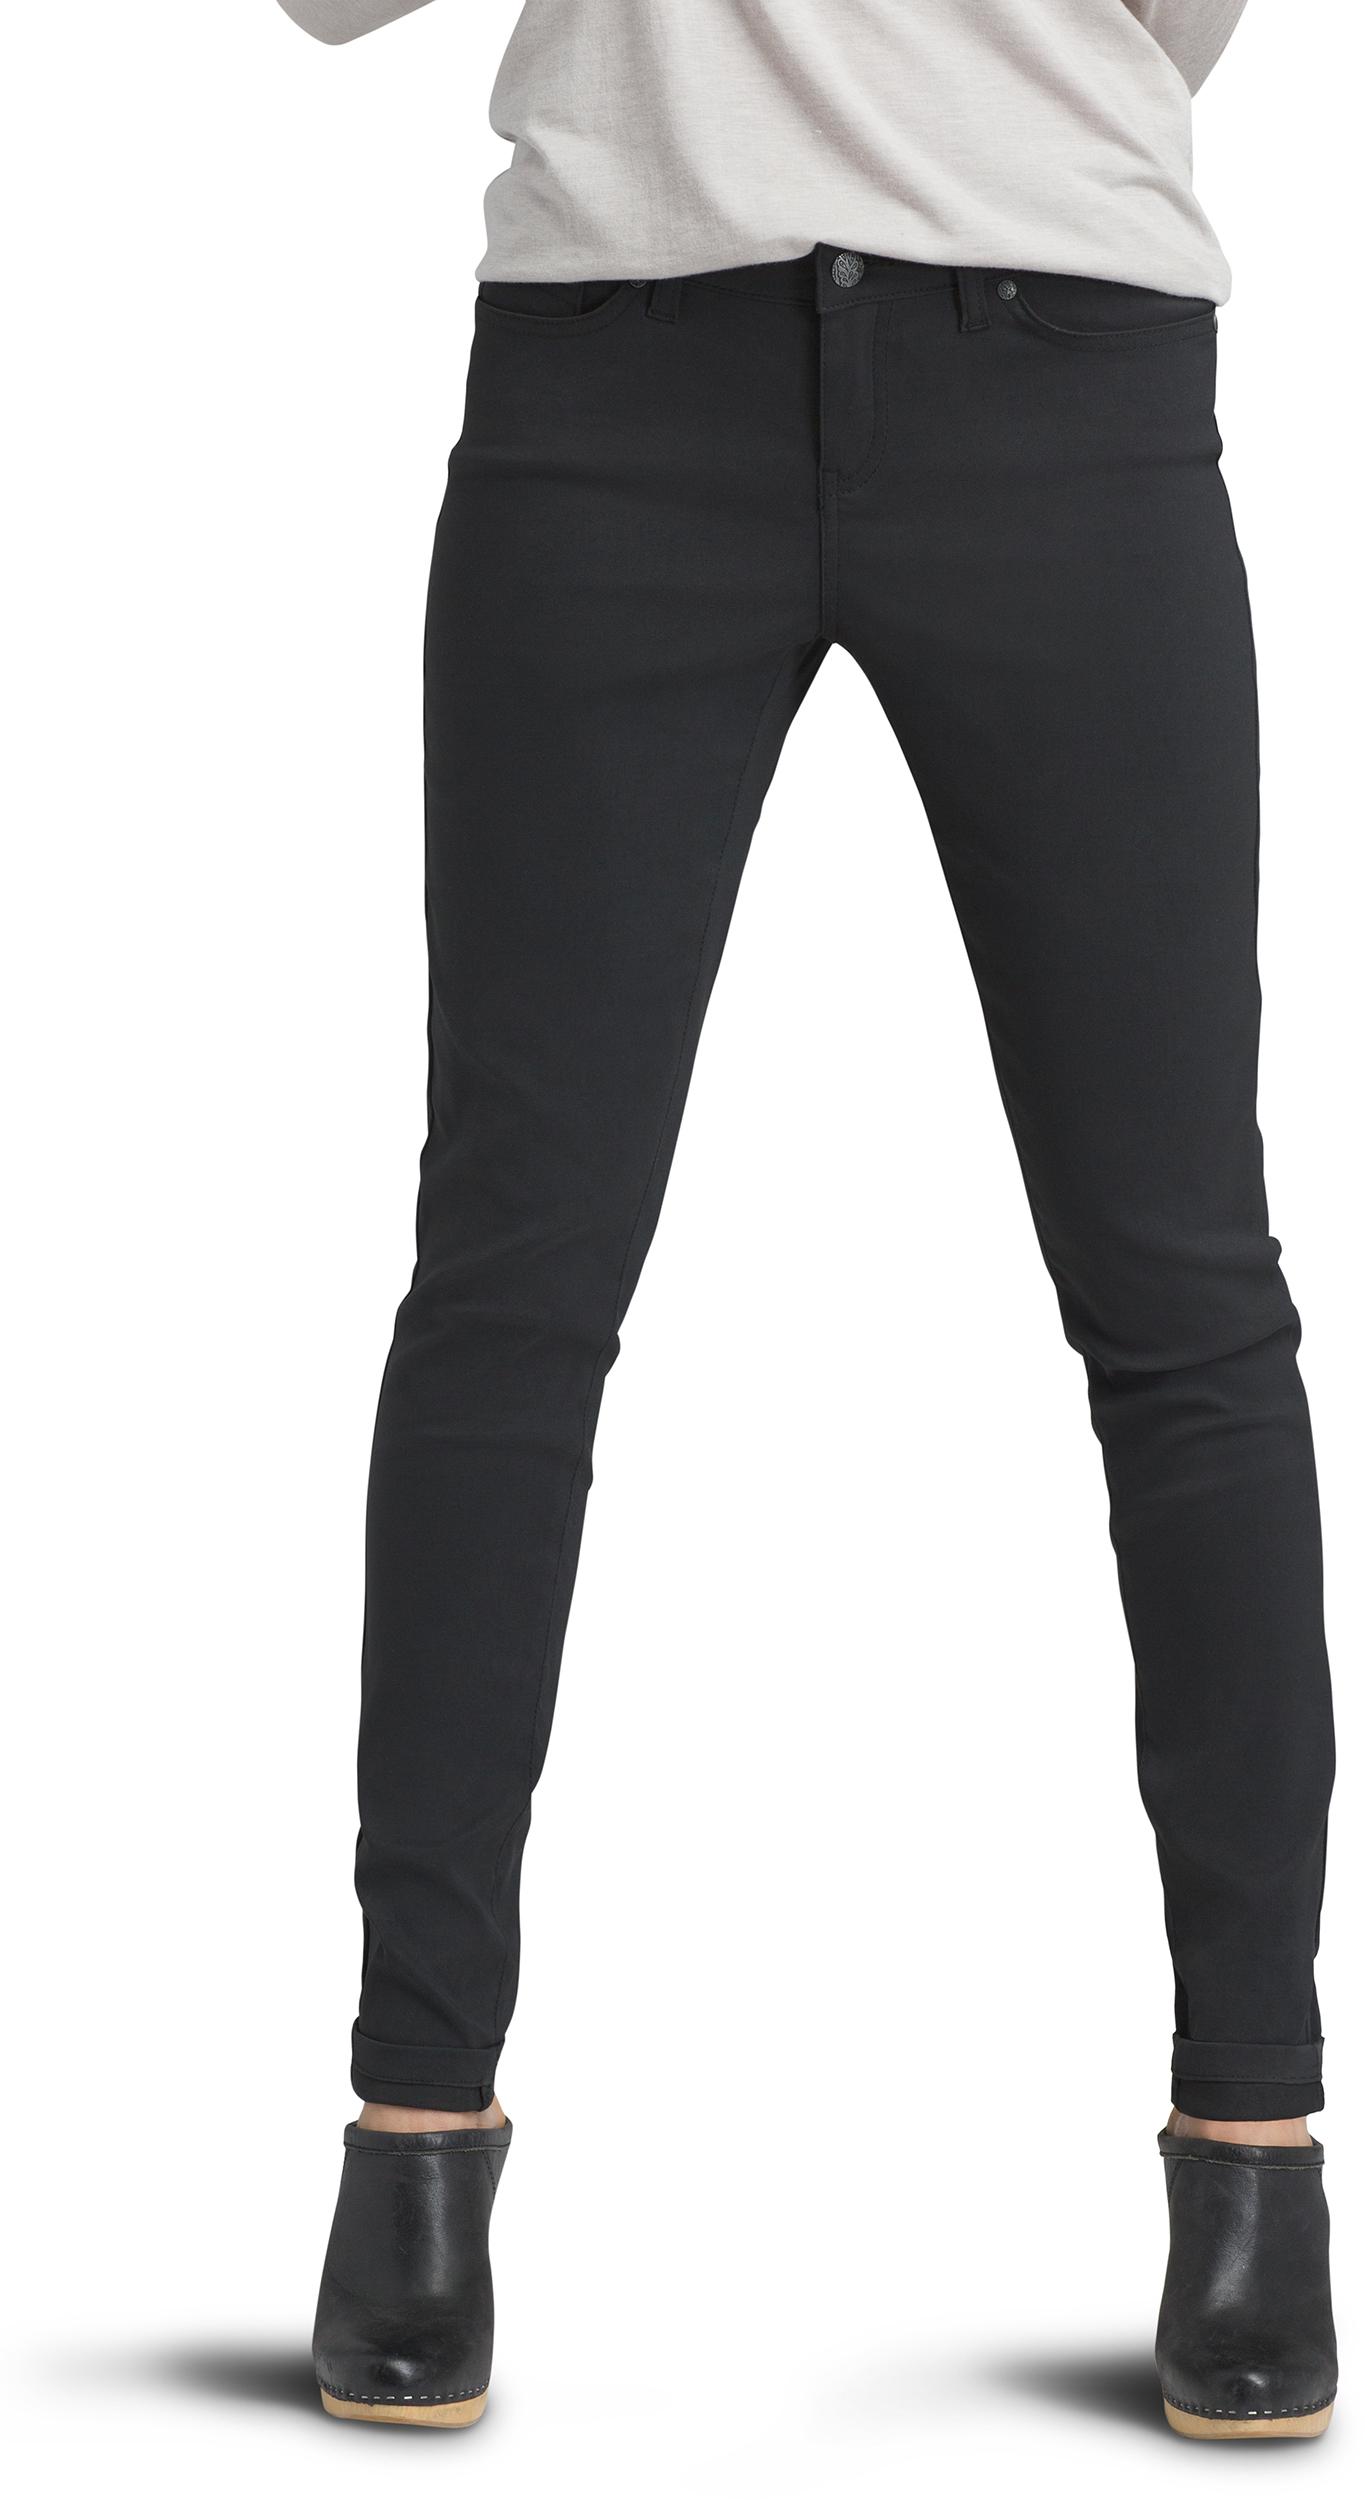 acc751f15d93 Women s Pants